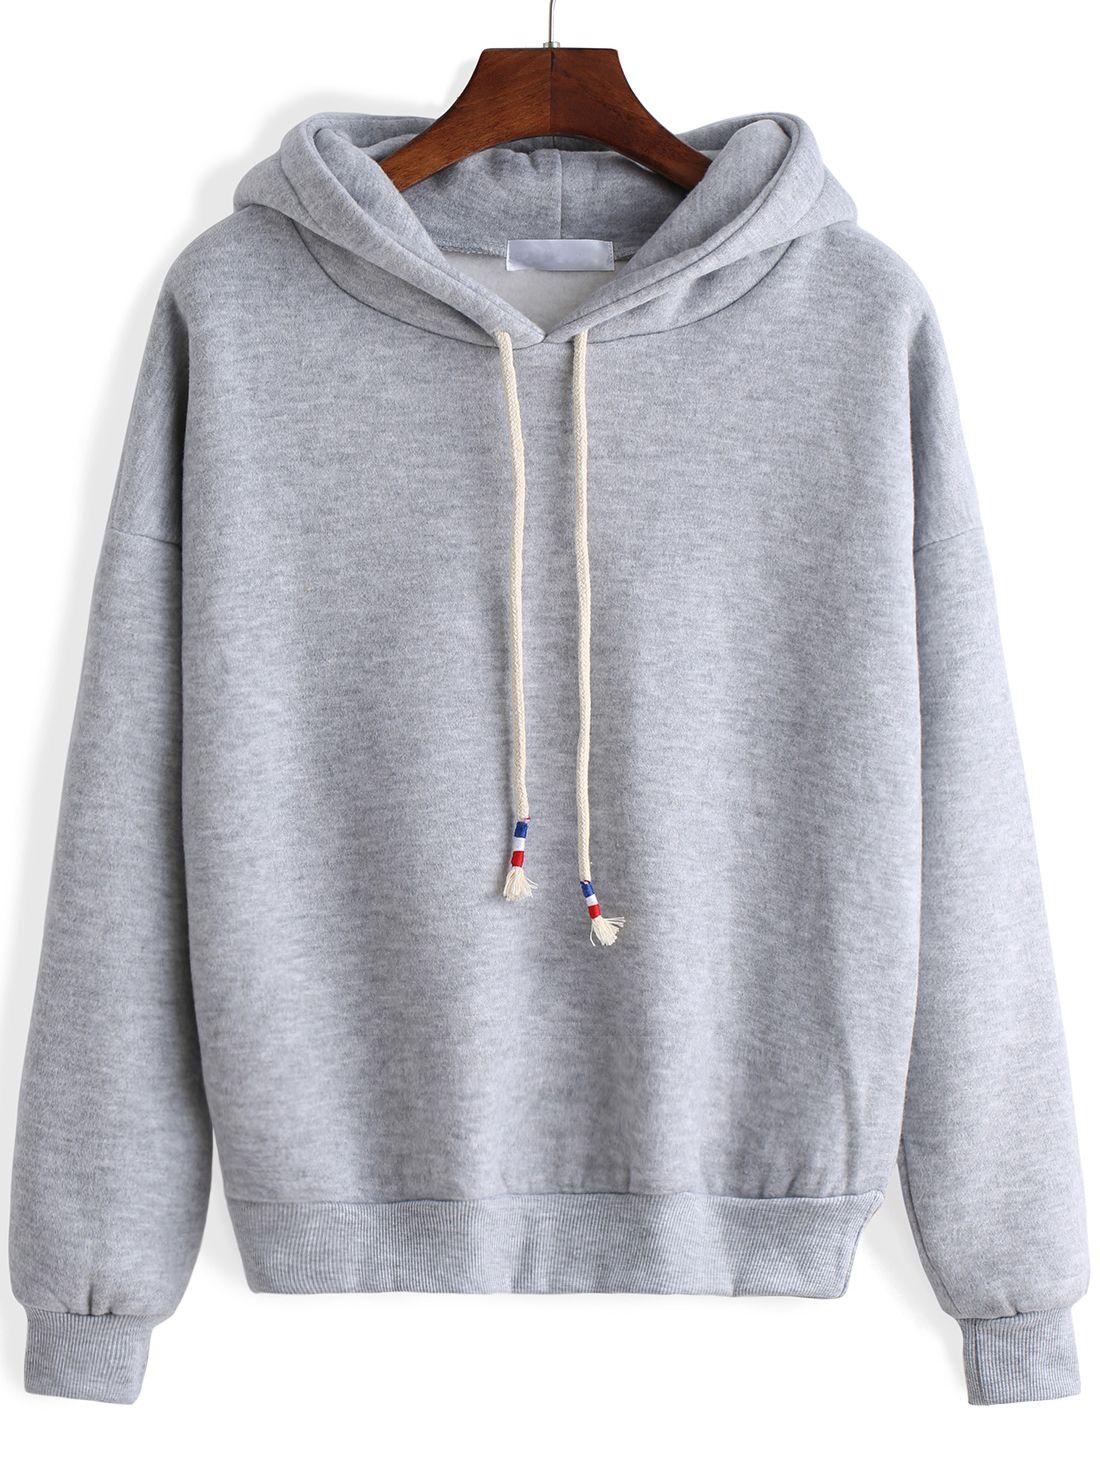 Grey Hooded Long Sleeve Crop Sweatshirt Sweatshirts Crop Sweatshirt Cute Sweatshirts [ 1465 x 1100 Pixel ]